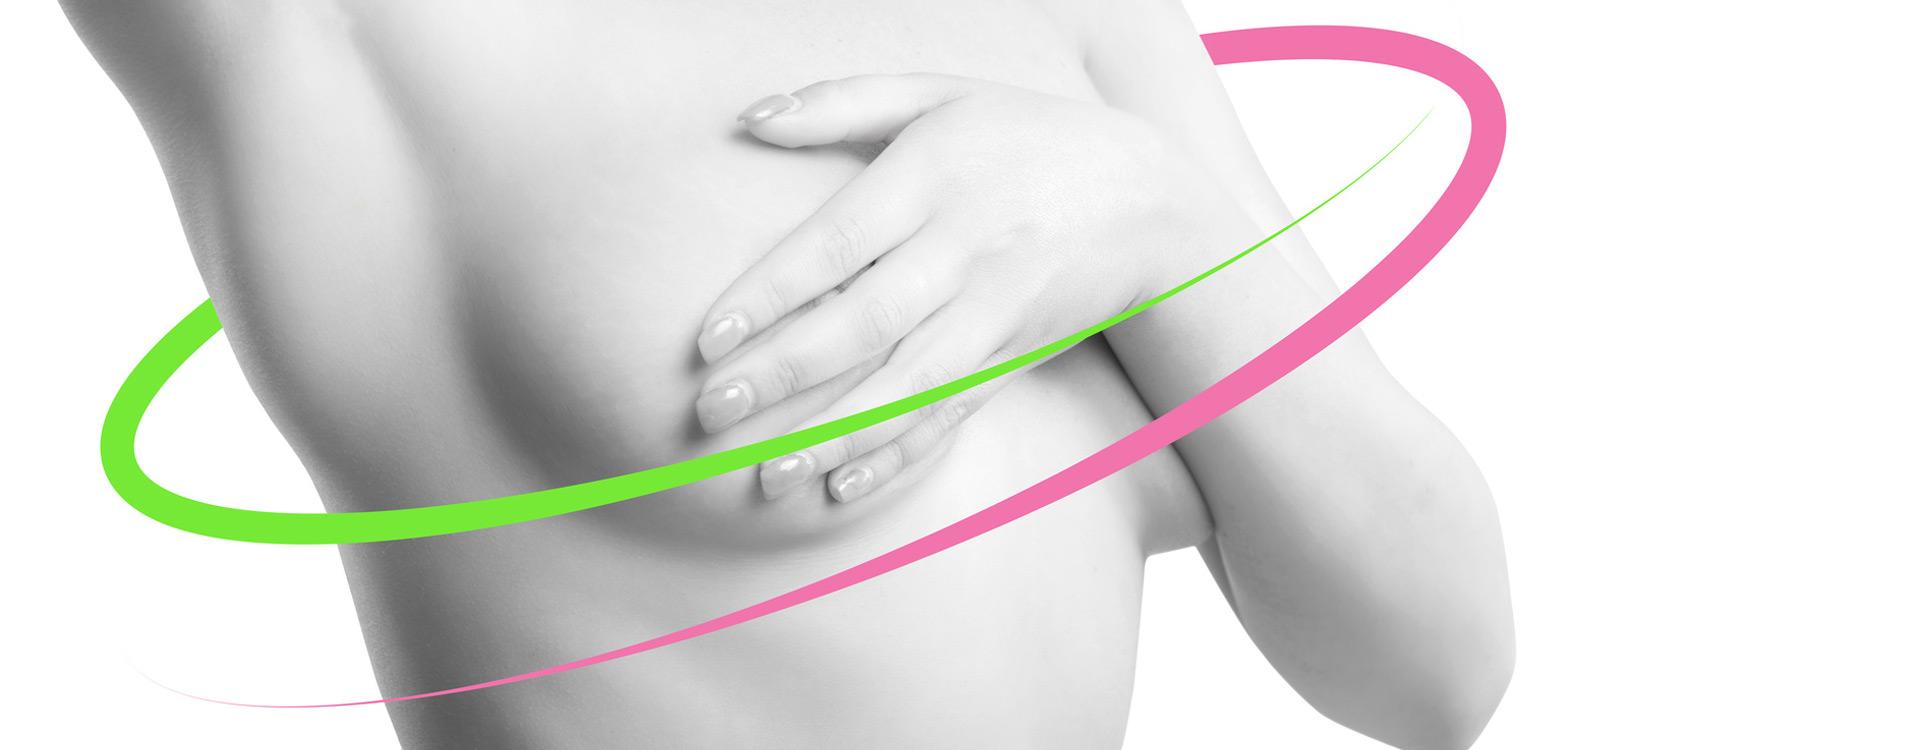 vente-prothese-mammaire-pharmacie-avre-roye-montdidier-nesle-rosiere-amiens-noyon-peronne